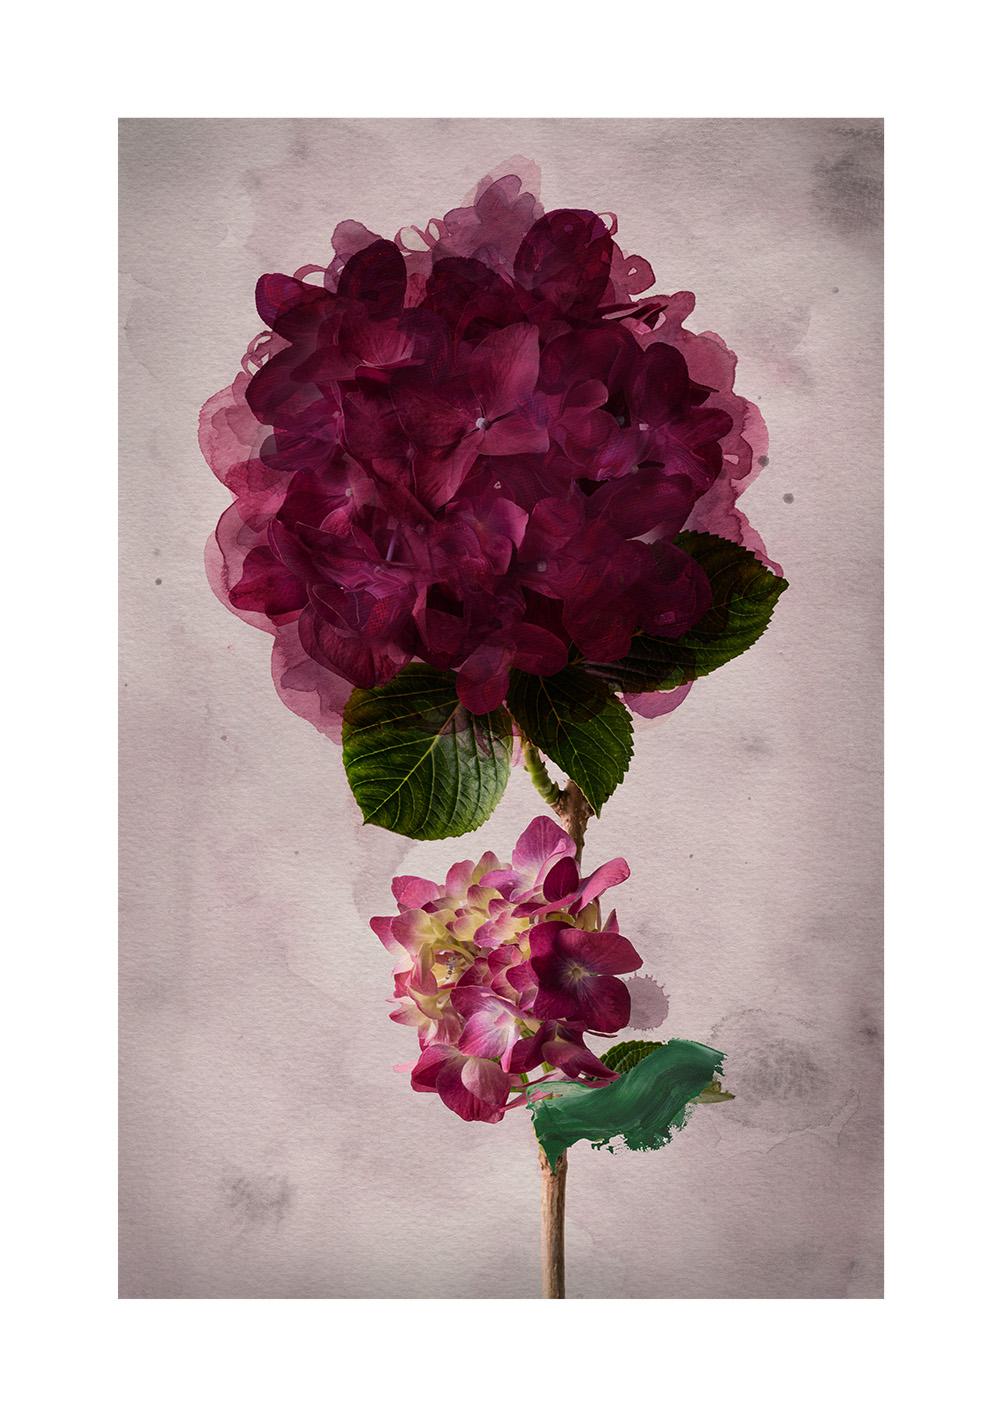 Vintage Bloom Limited Edition Print